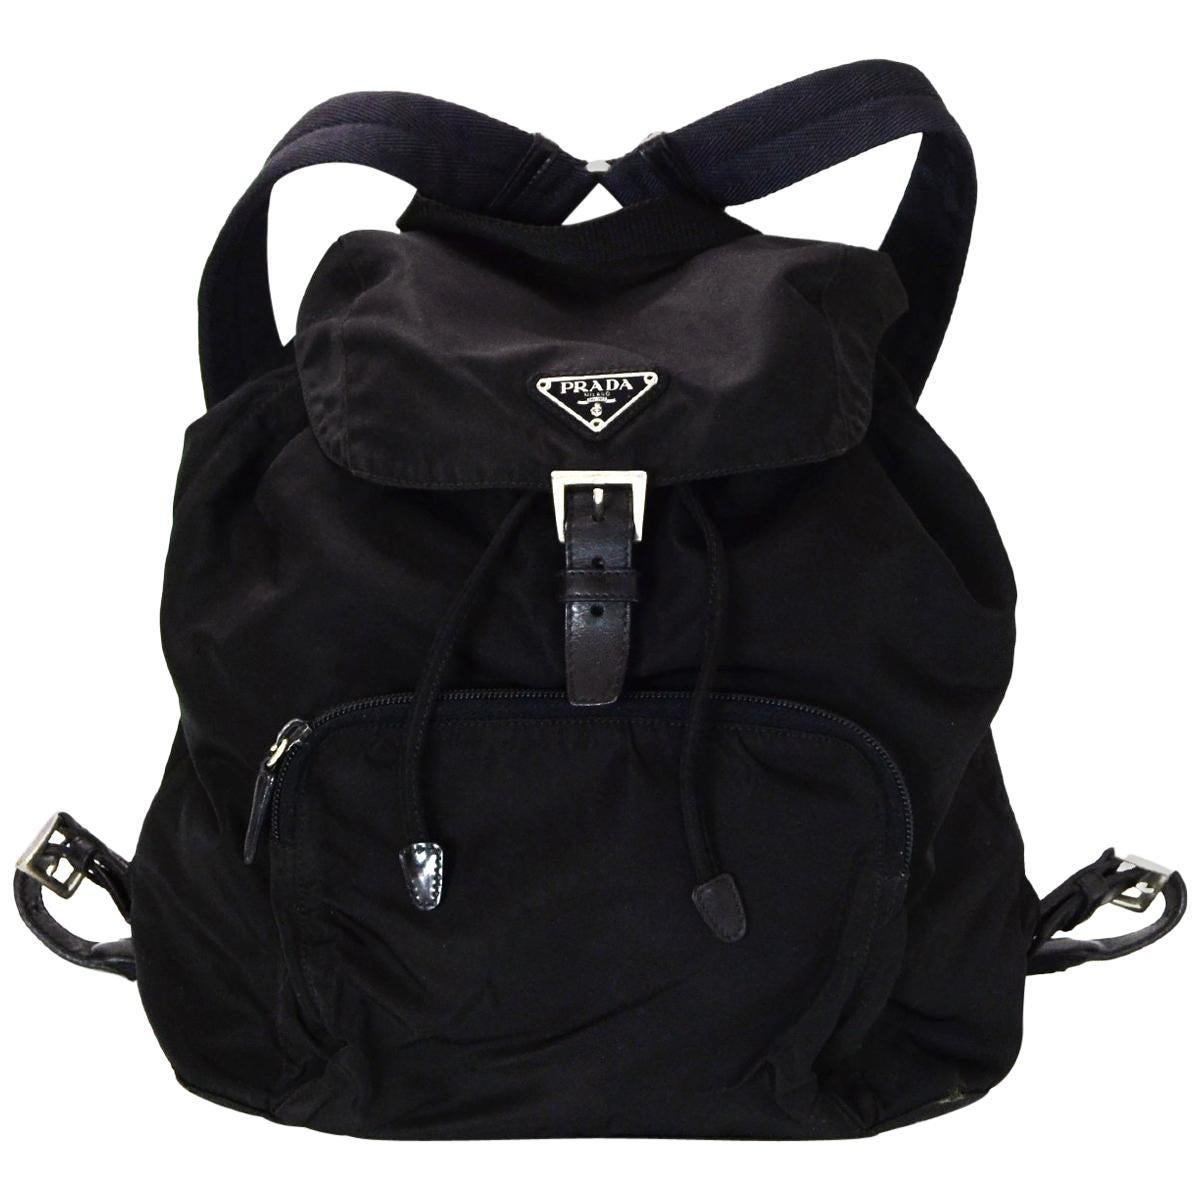 760571a31203d0 50% off prada black nylon front zip pocket backpack bag 902c9 1da04